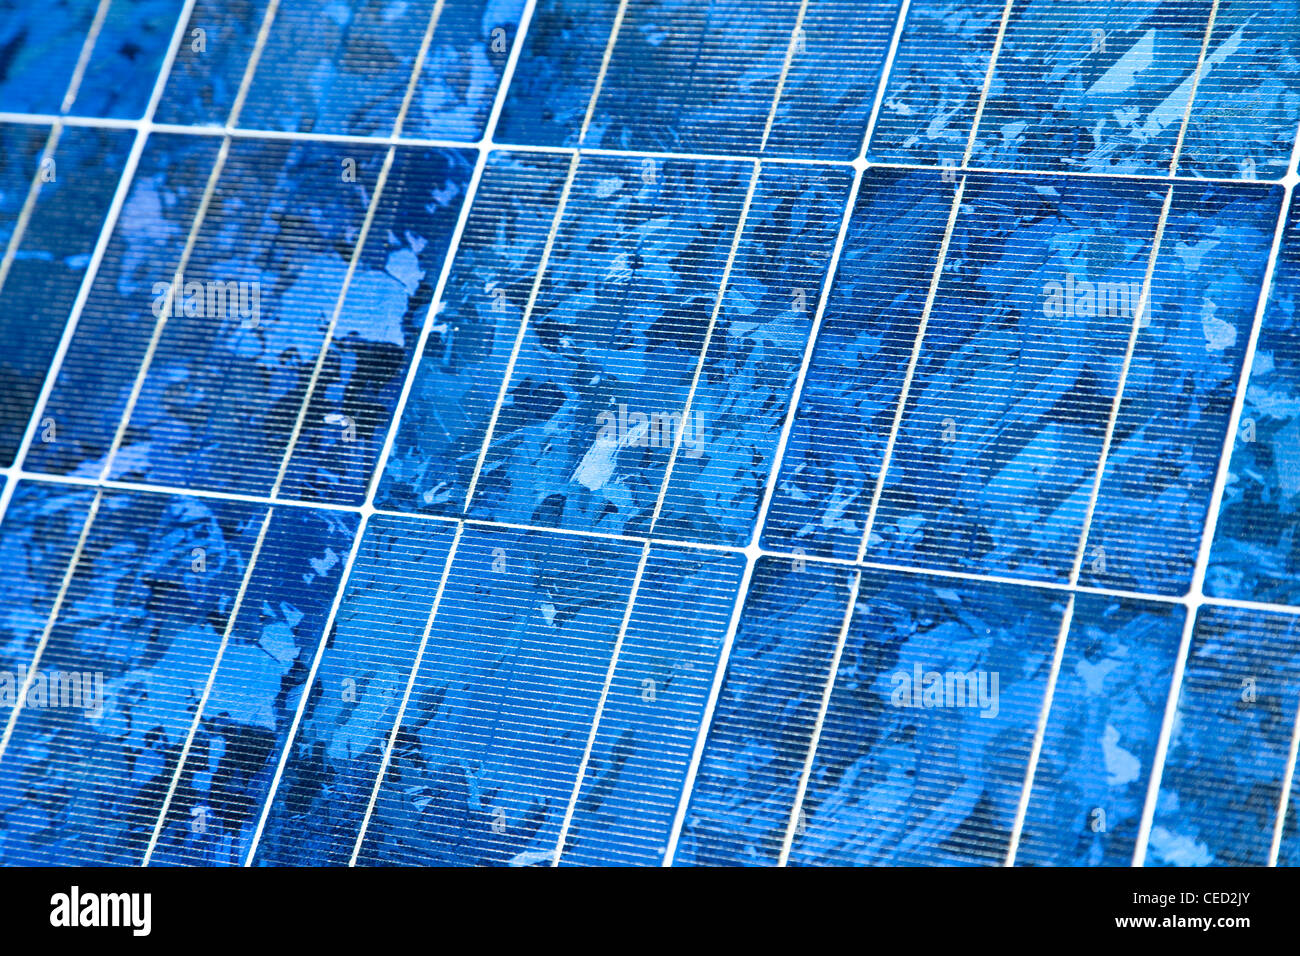 Panel solar, close-up - Photovoltaik Modul, Nahaufnahme Imagen De Stock